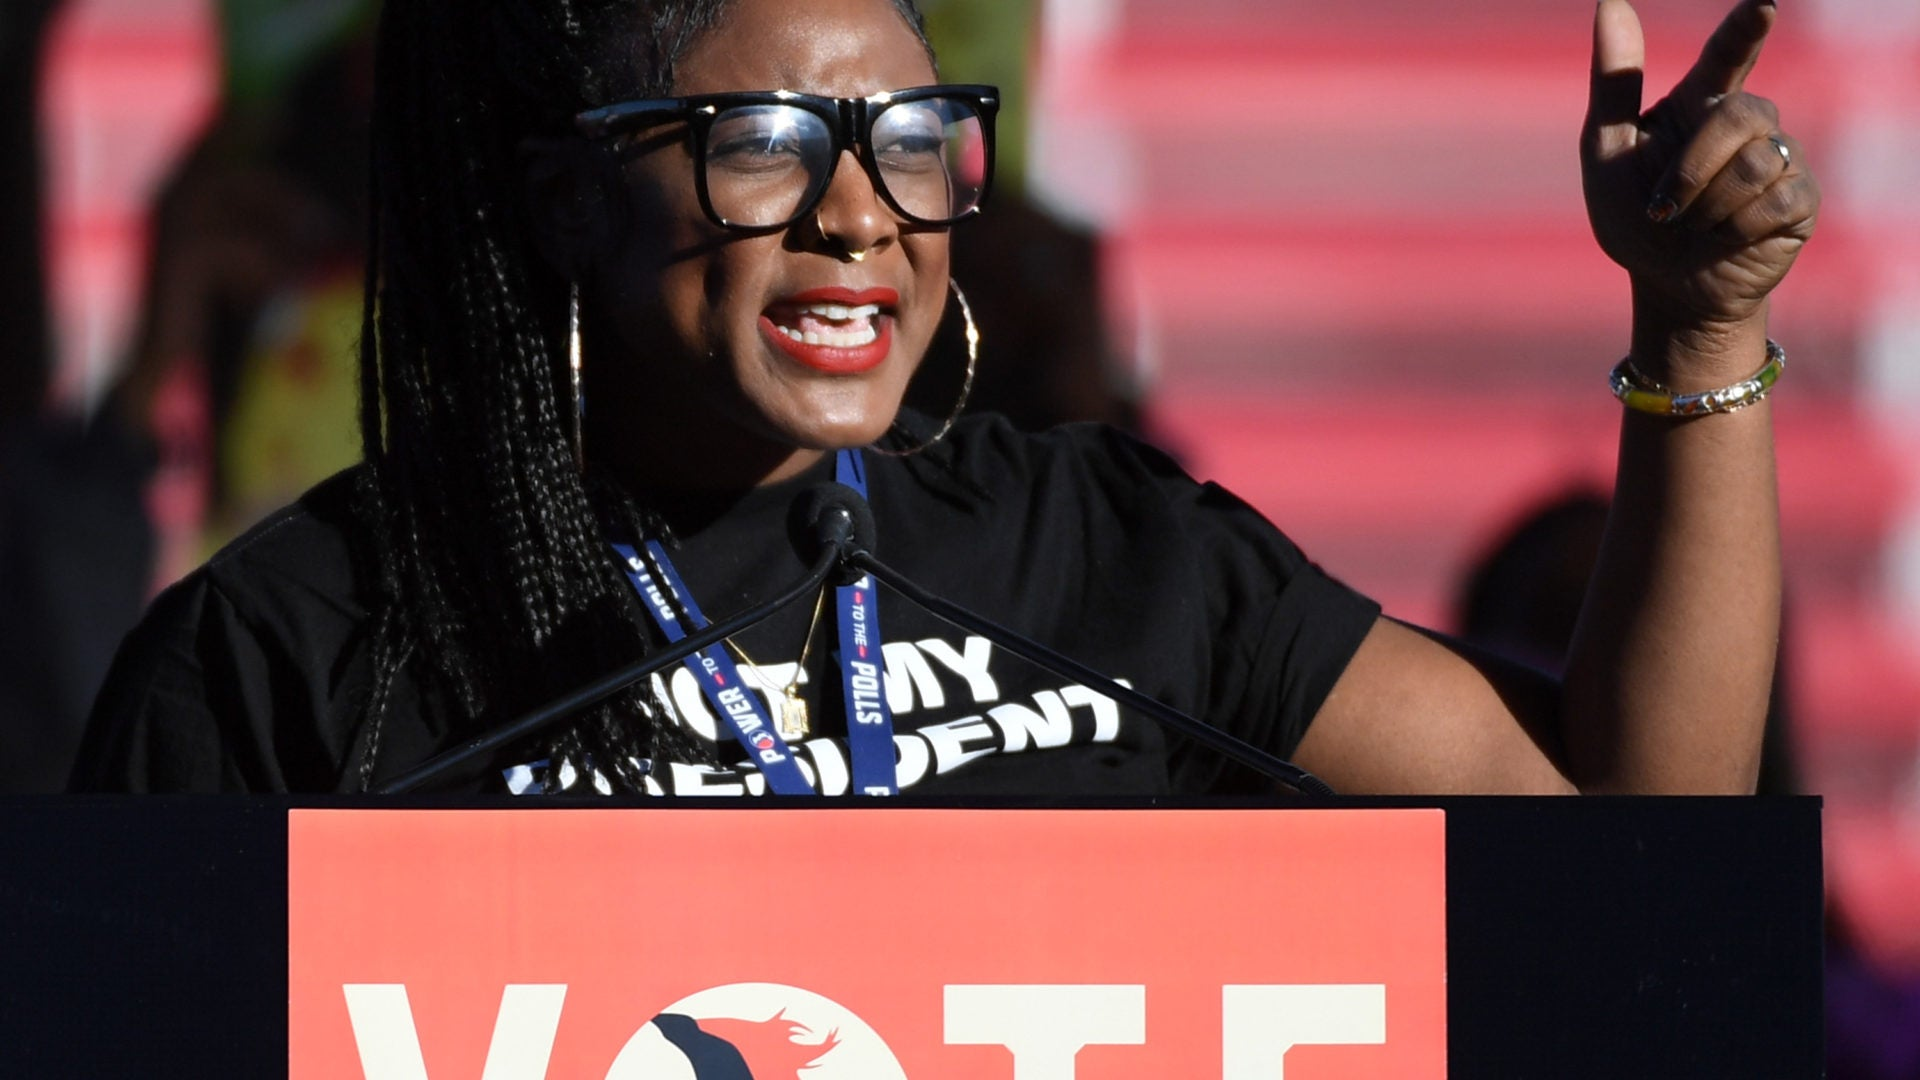 Women-Led Organization Kicks Off Bus Tour To Mobilize Female Voters